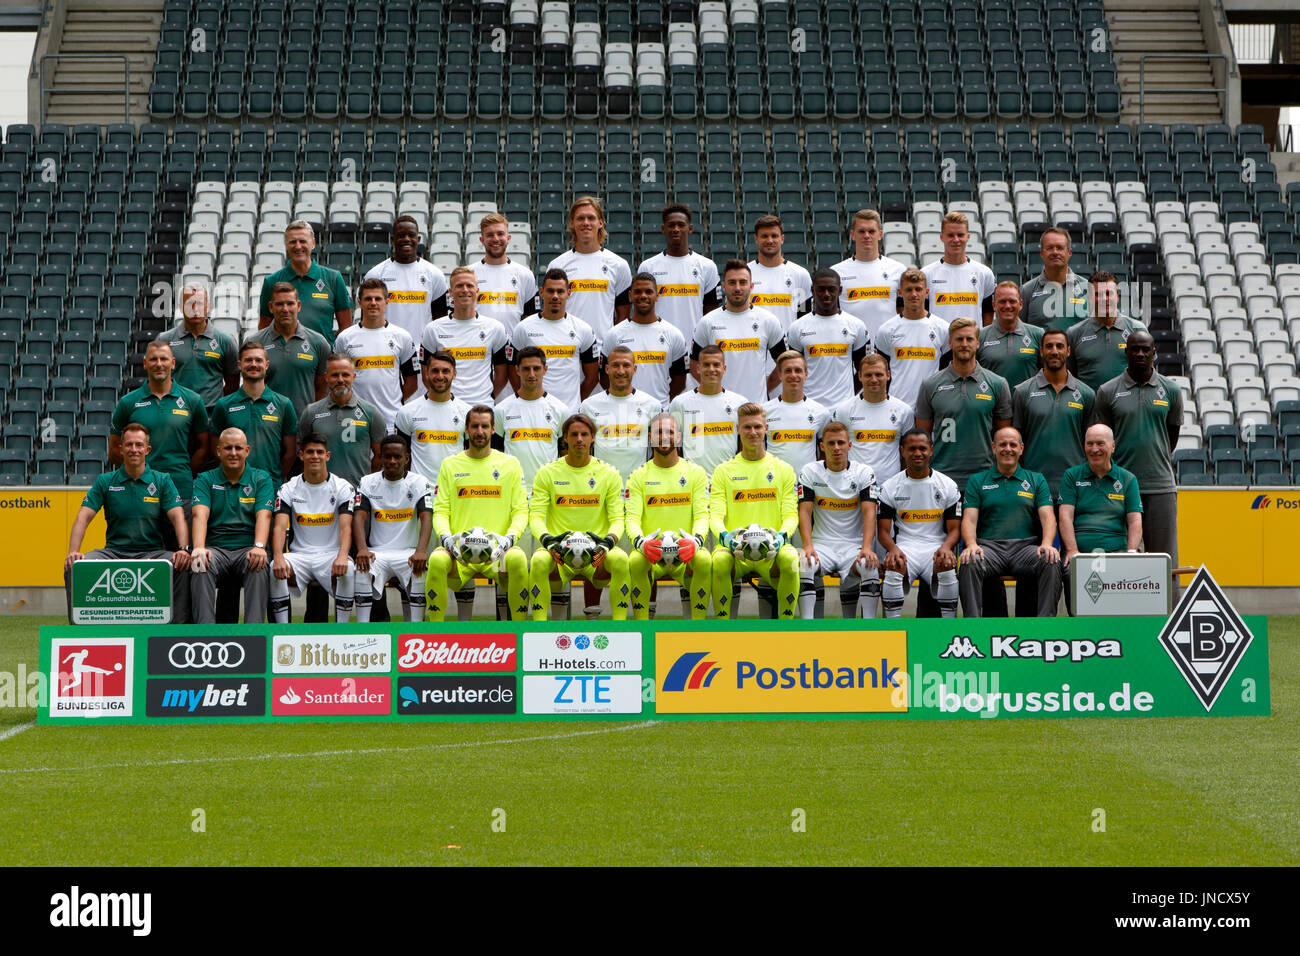 football,Bundesliga,2017/2018,team shot Borussia Moenchengladbach,row1f.a. f.l.t.r. team doctor Dr. Hertl,Zakaria,Kramer,Vestergaard,Oxford,Strobl,Ginter,Elvedi,head of medicine and prevention Dr. Schlumberger,row2f.a. f.l.t.r. assistant coach Geideck,goalkeeping coach Kamps,Hofmann,Wendt,Kolodziejczak,Yeboah,Drmic,Doucoure,Cuisance,assistant coach Bremser,head coach Hecking,row3f.a. f.l.t.r. physiotherapist Dirk Mueller,physiotherapist Bohnen,rehab coach Bluhm,Grifo,Stindl,Johnson,Benes,Herrmann,Jantschke,fitness coach Markus Mueller,fitness coach Mouhcine,c - Stock Image